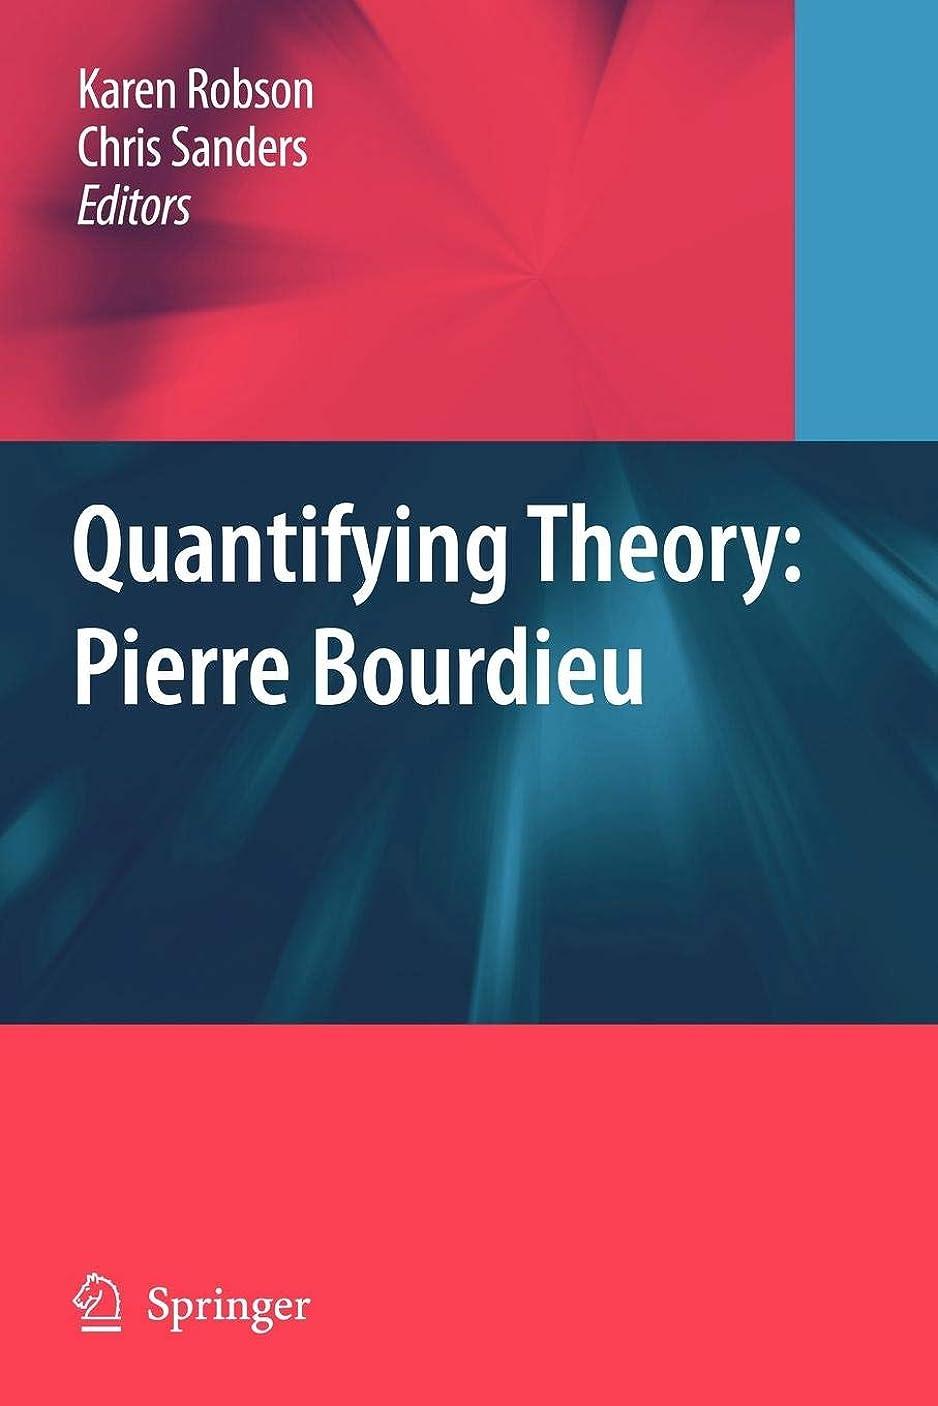 橋予測子オピエートQuantifying Theory: Pierre Bourdieu: Pierre Bourdieu